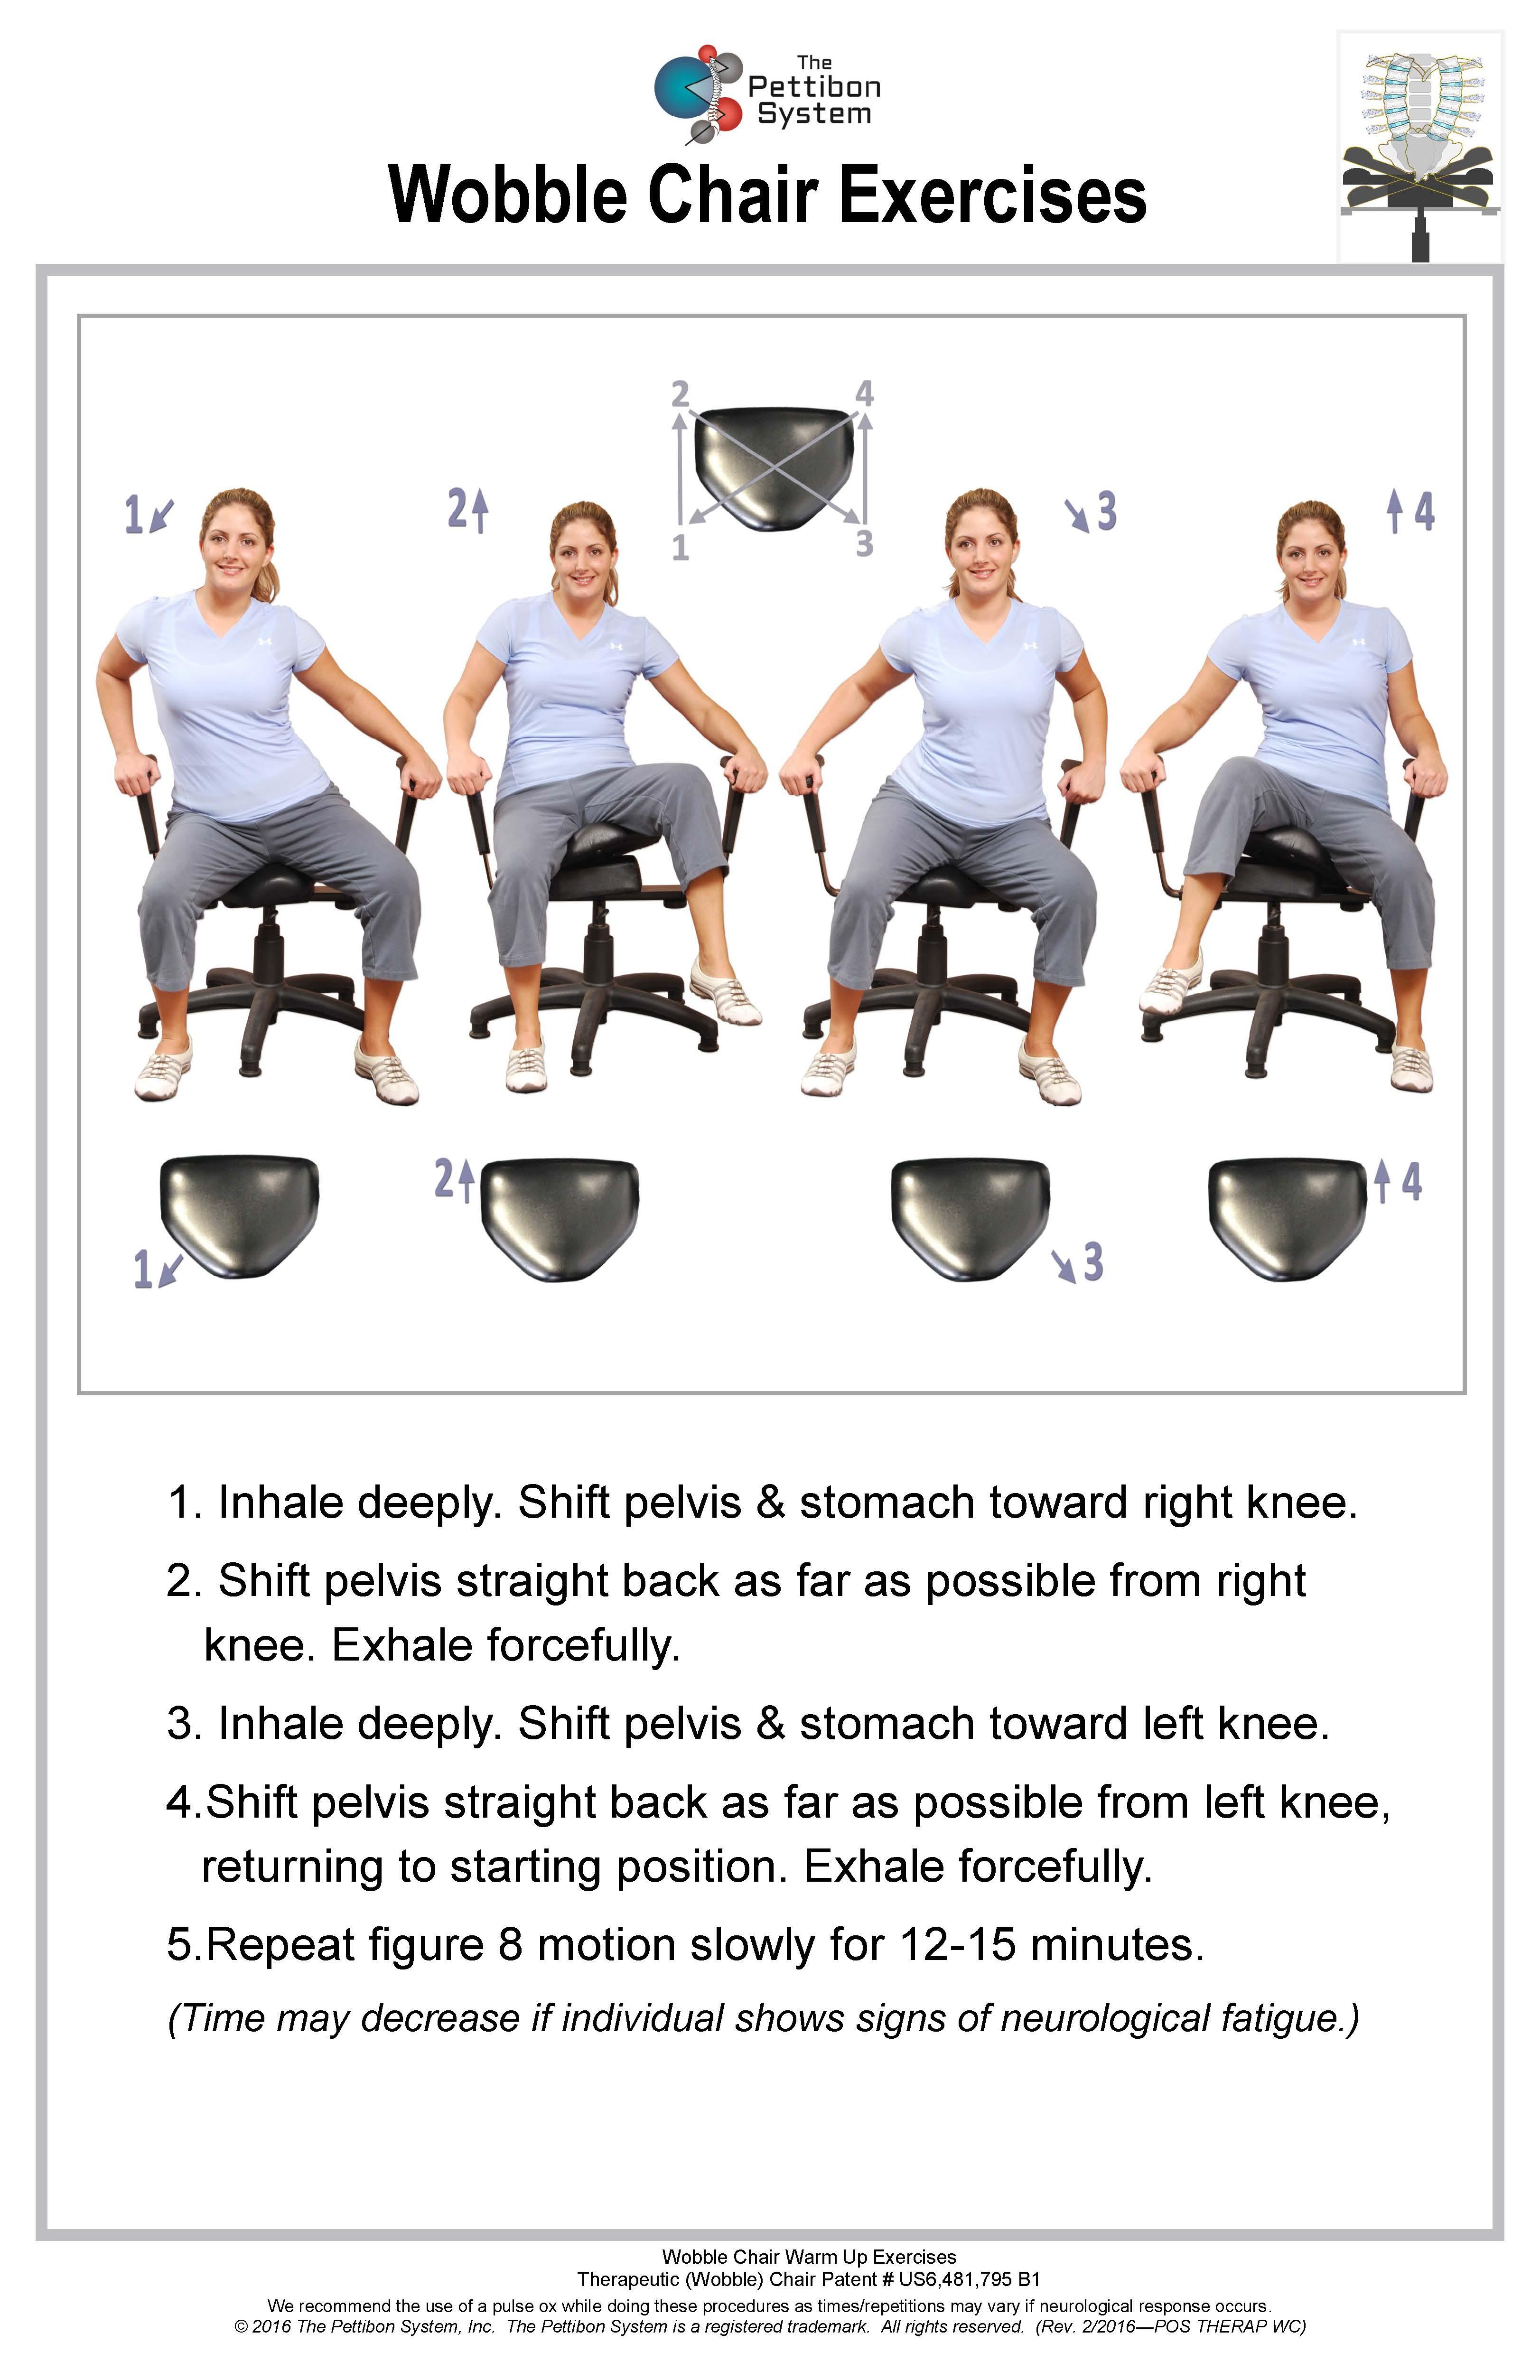 Wobble Chair Therapeutic The Pettibon System